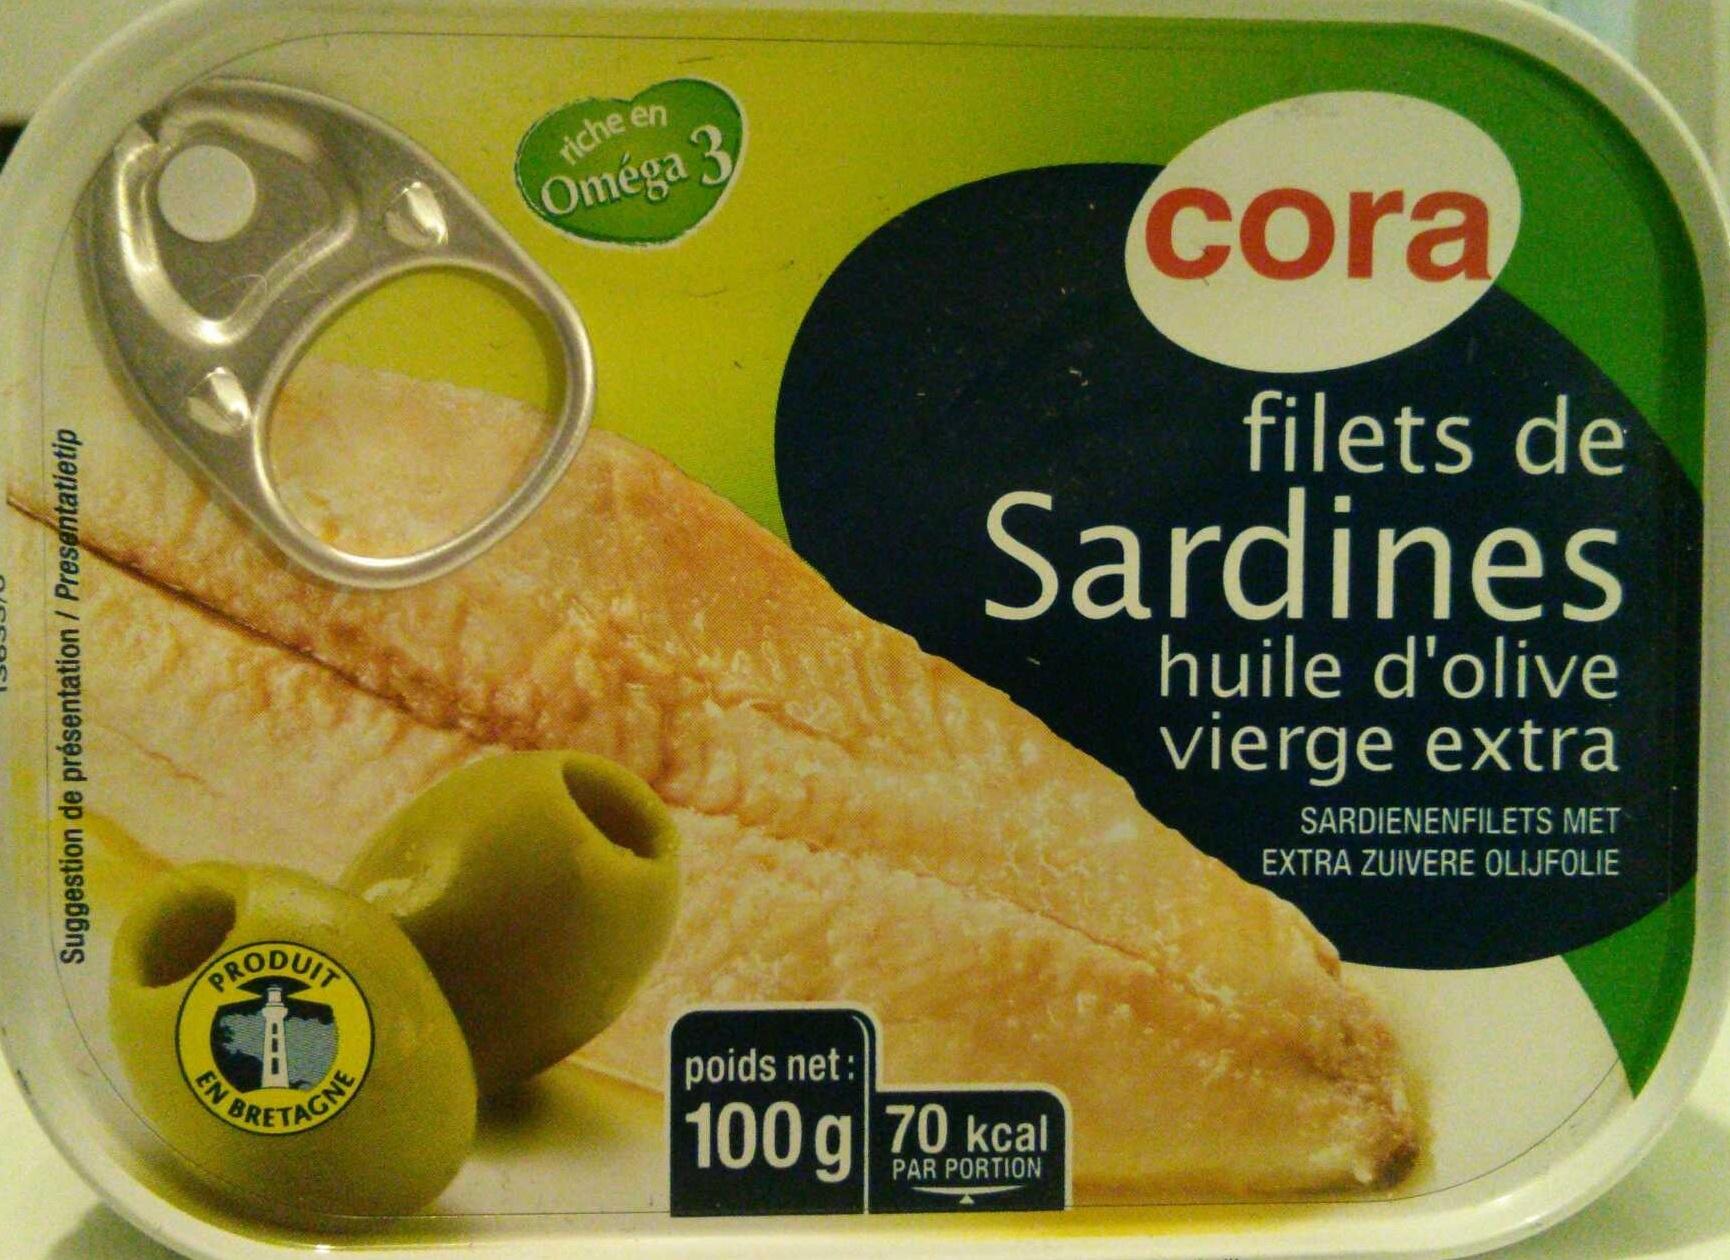 Filet de sardines - Product